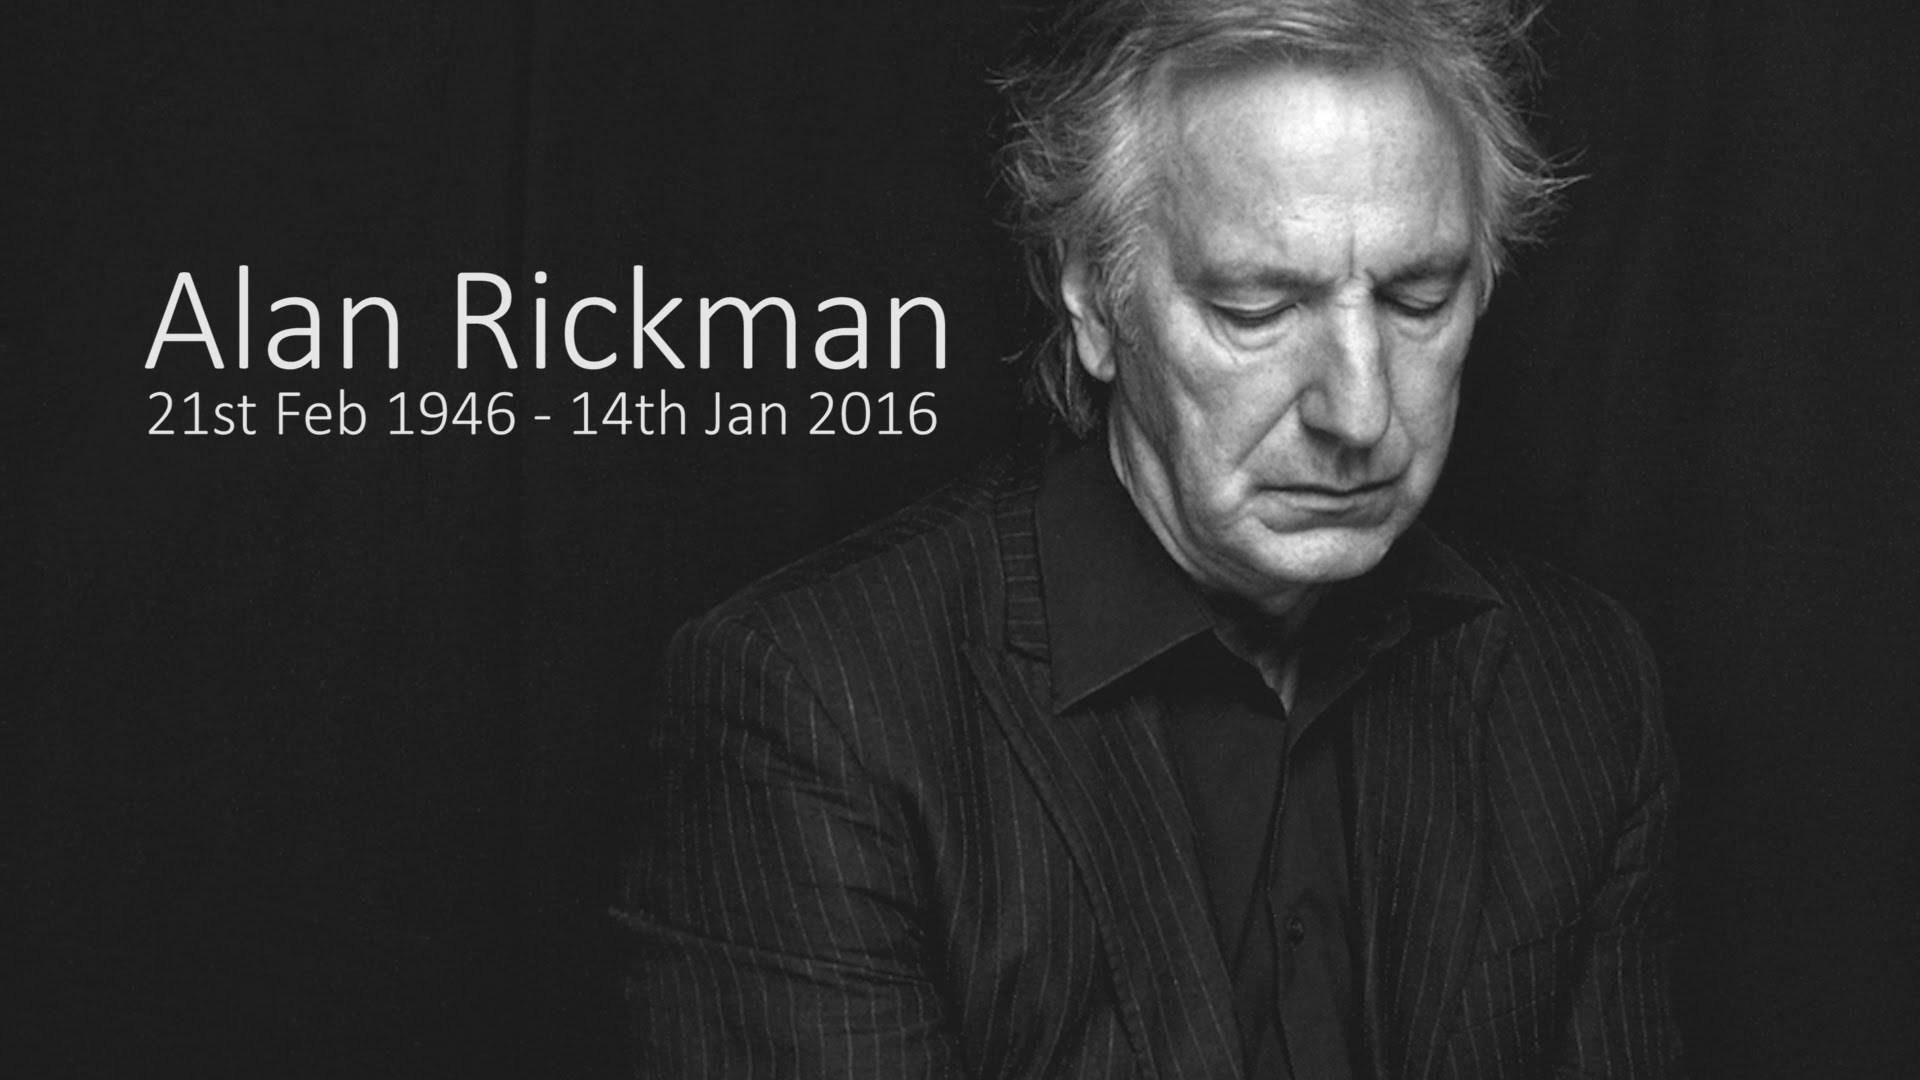 Alan Rickman Wallpapers Images Photos Pictures Backgrounds